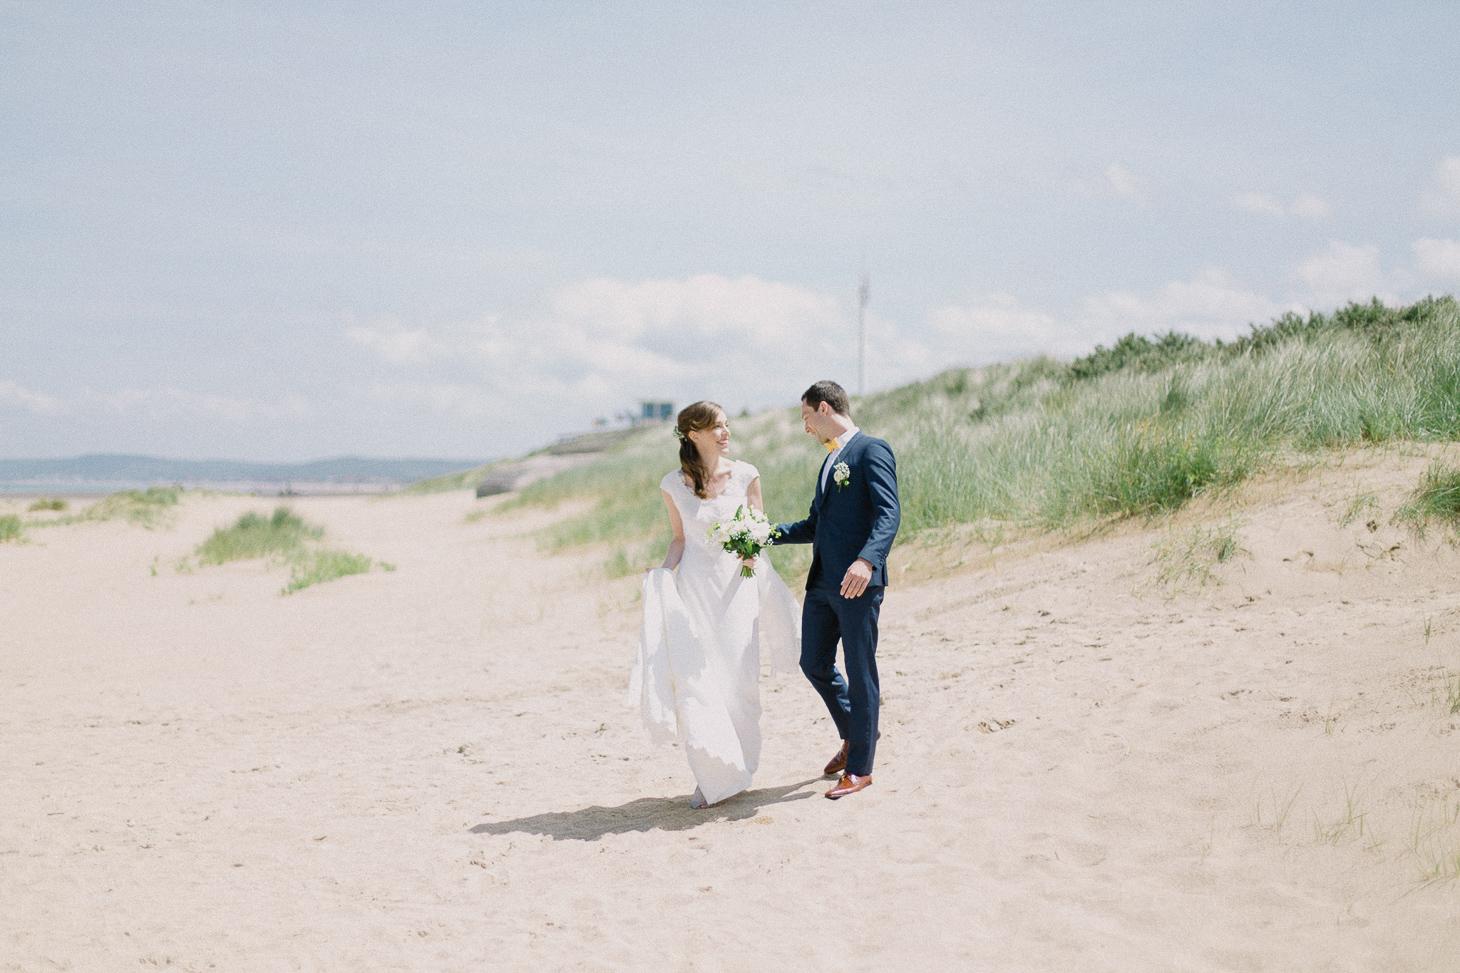 photographe-mariage-champ-de-launay-normandie-00022